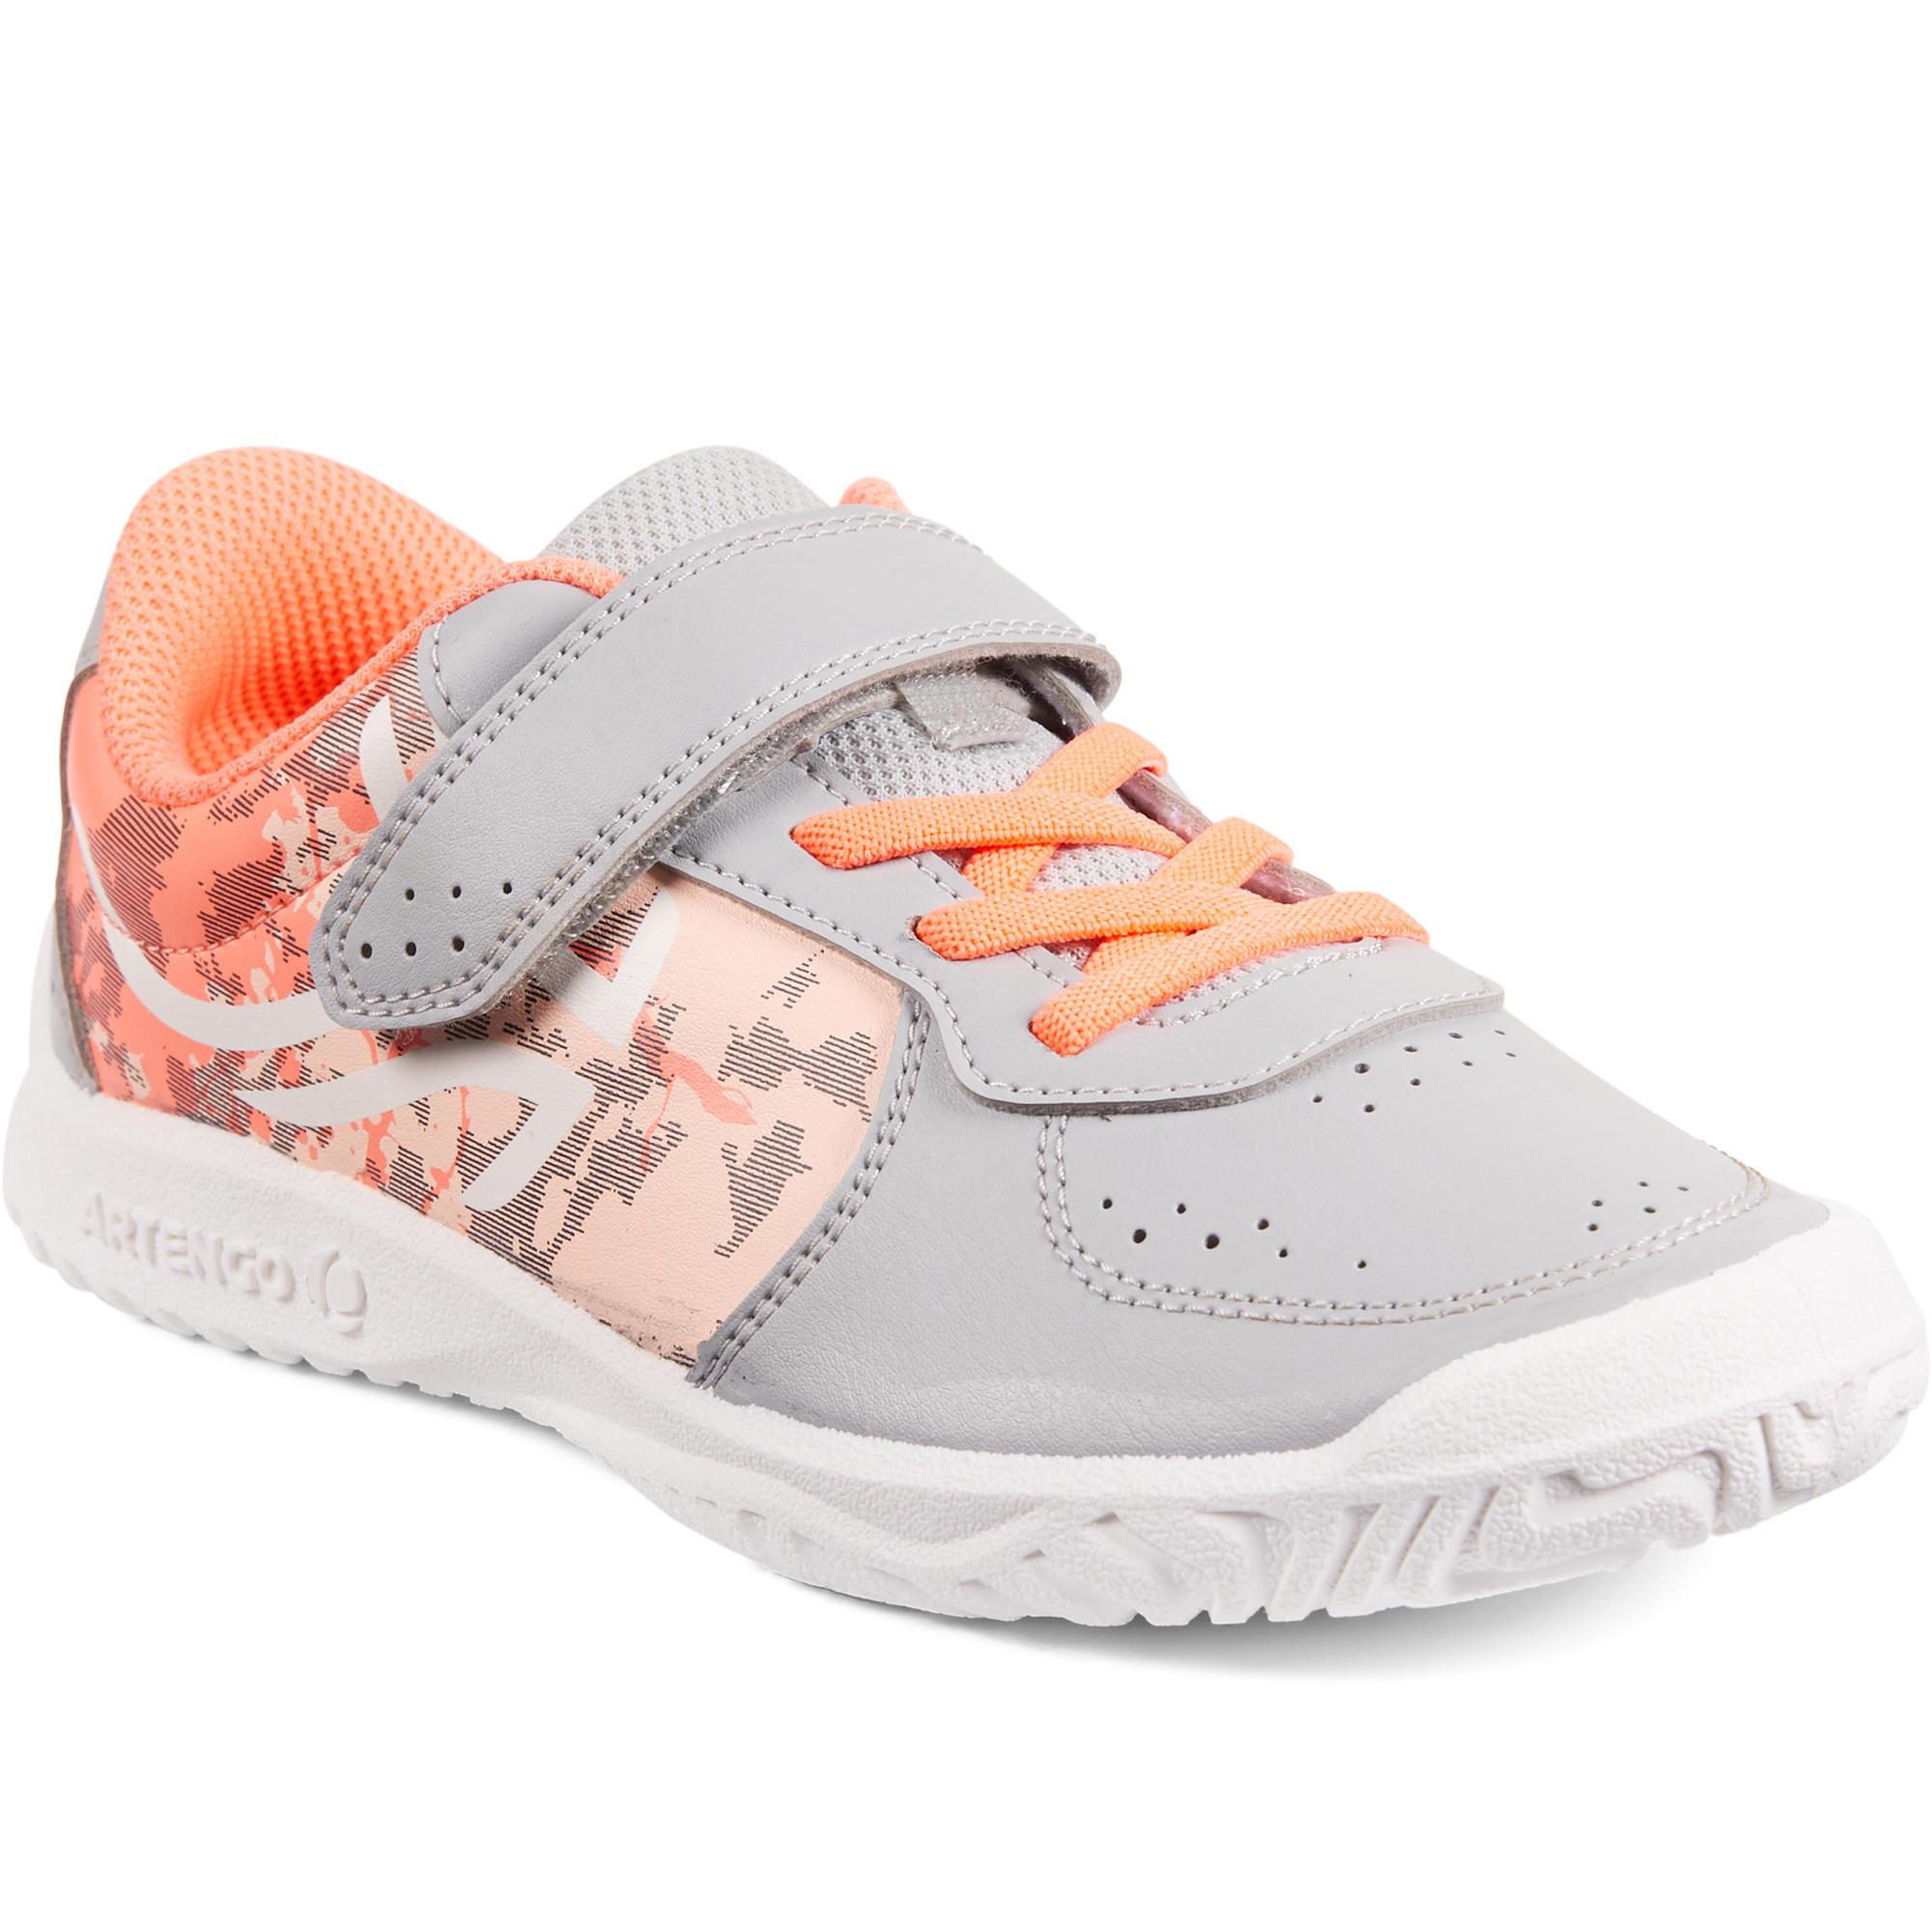 576da4638d017 Junior Shoes - TS130 JR Kids' Tennis Shoes - Camo Girl